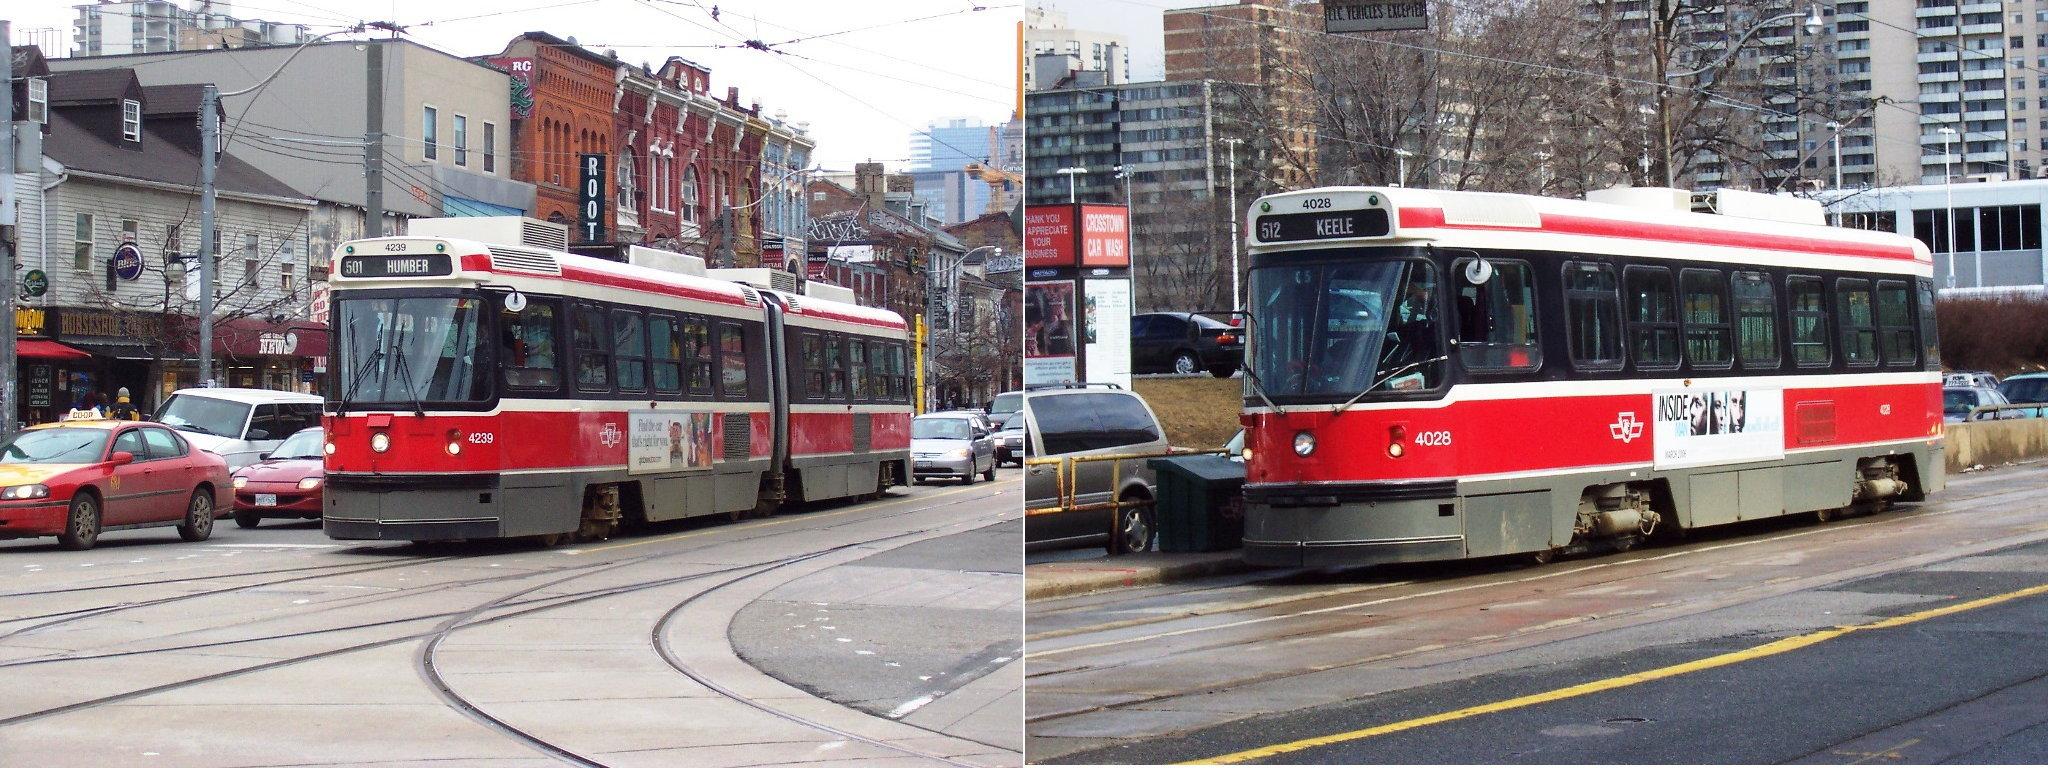 Tiedosto:TTC ALRV and CLRV streetcars 4239 and 4028.jpg